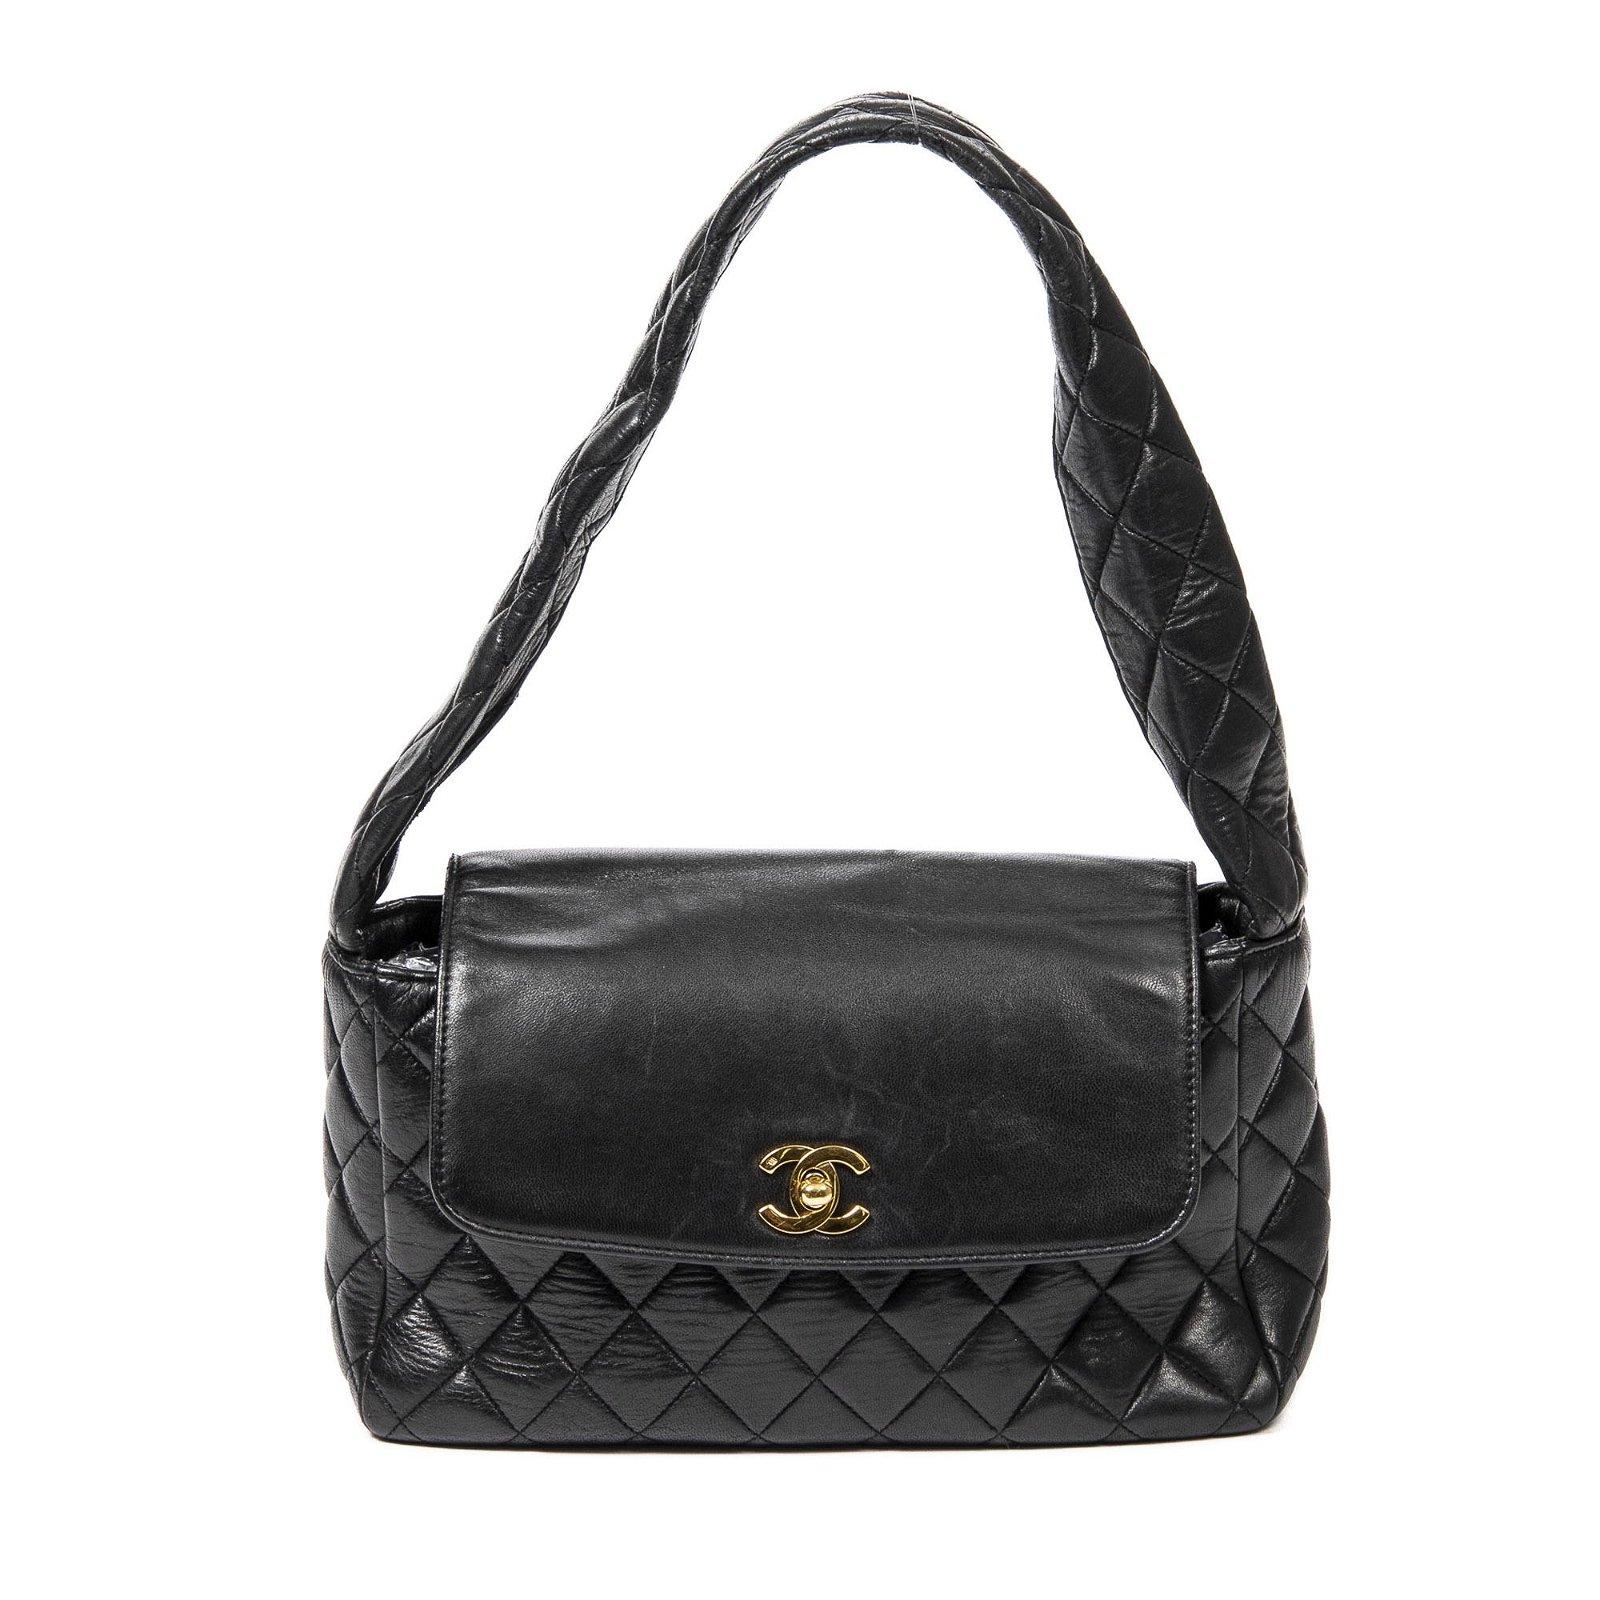 Chanel Calf Leather Rectangular Flap Handbag